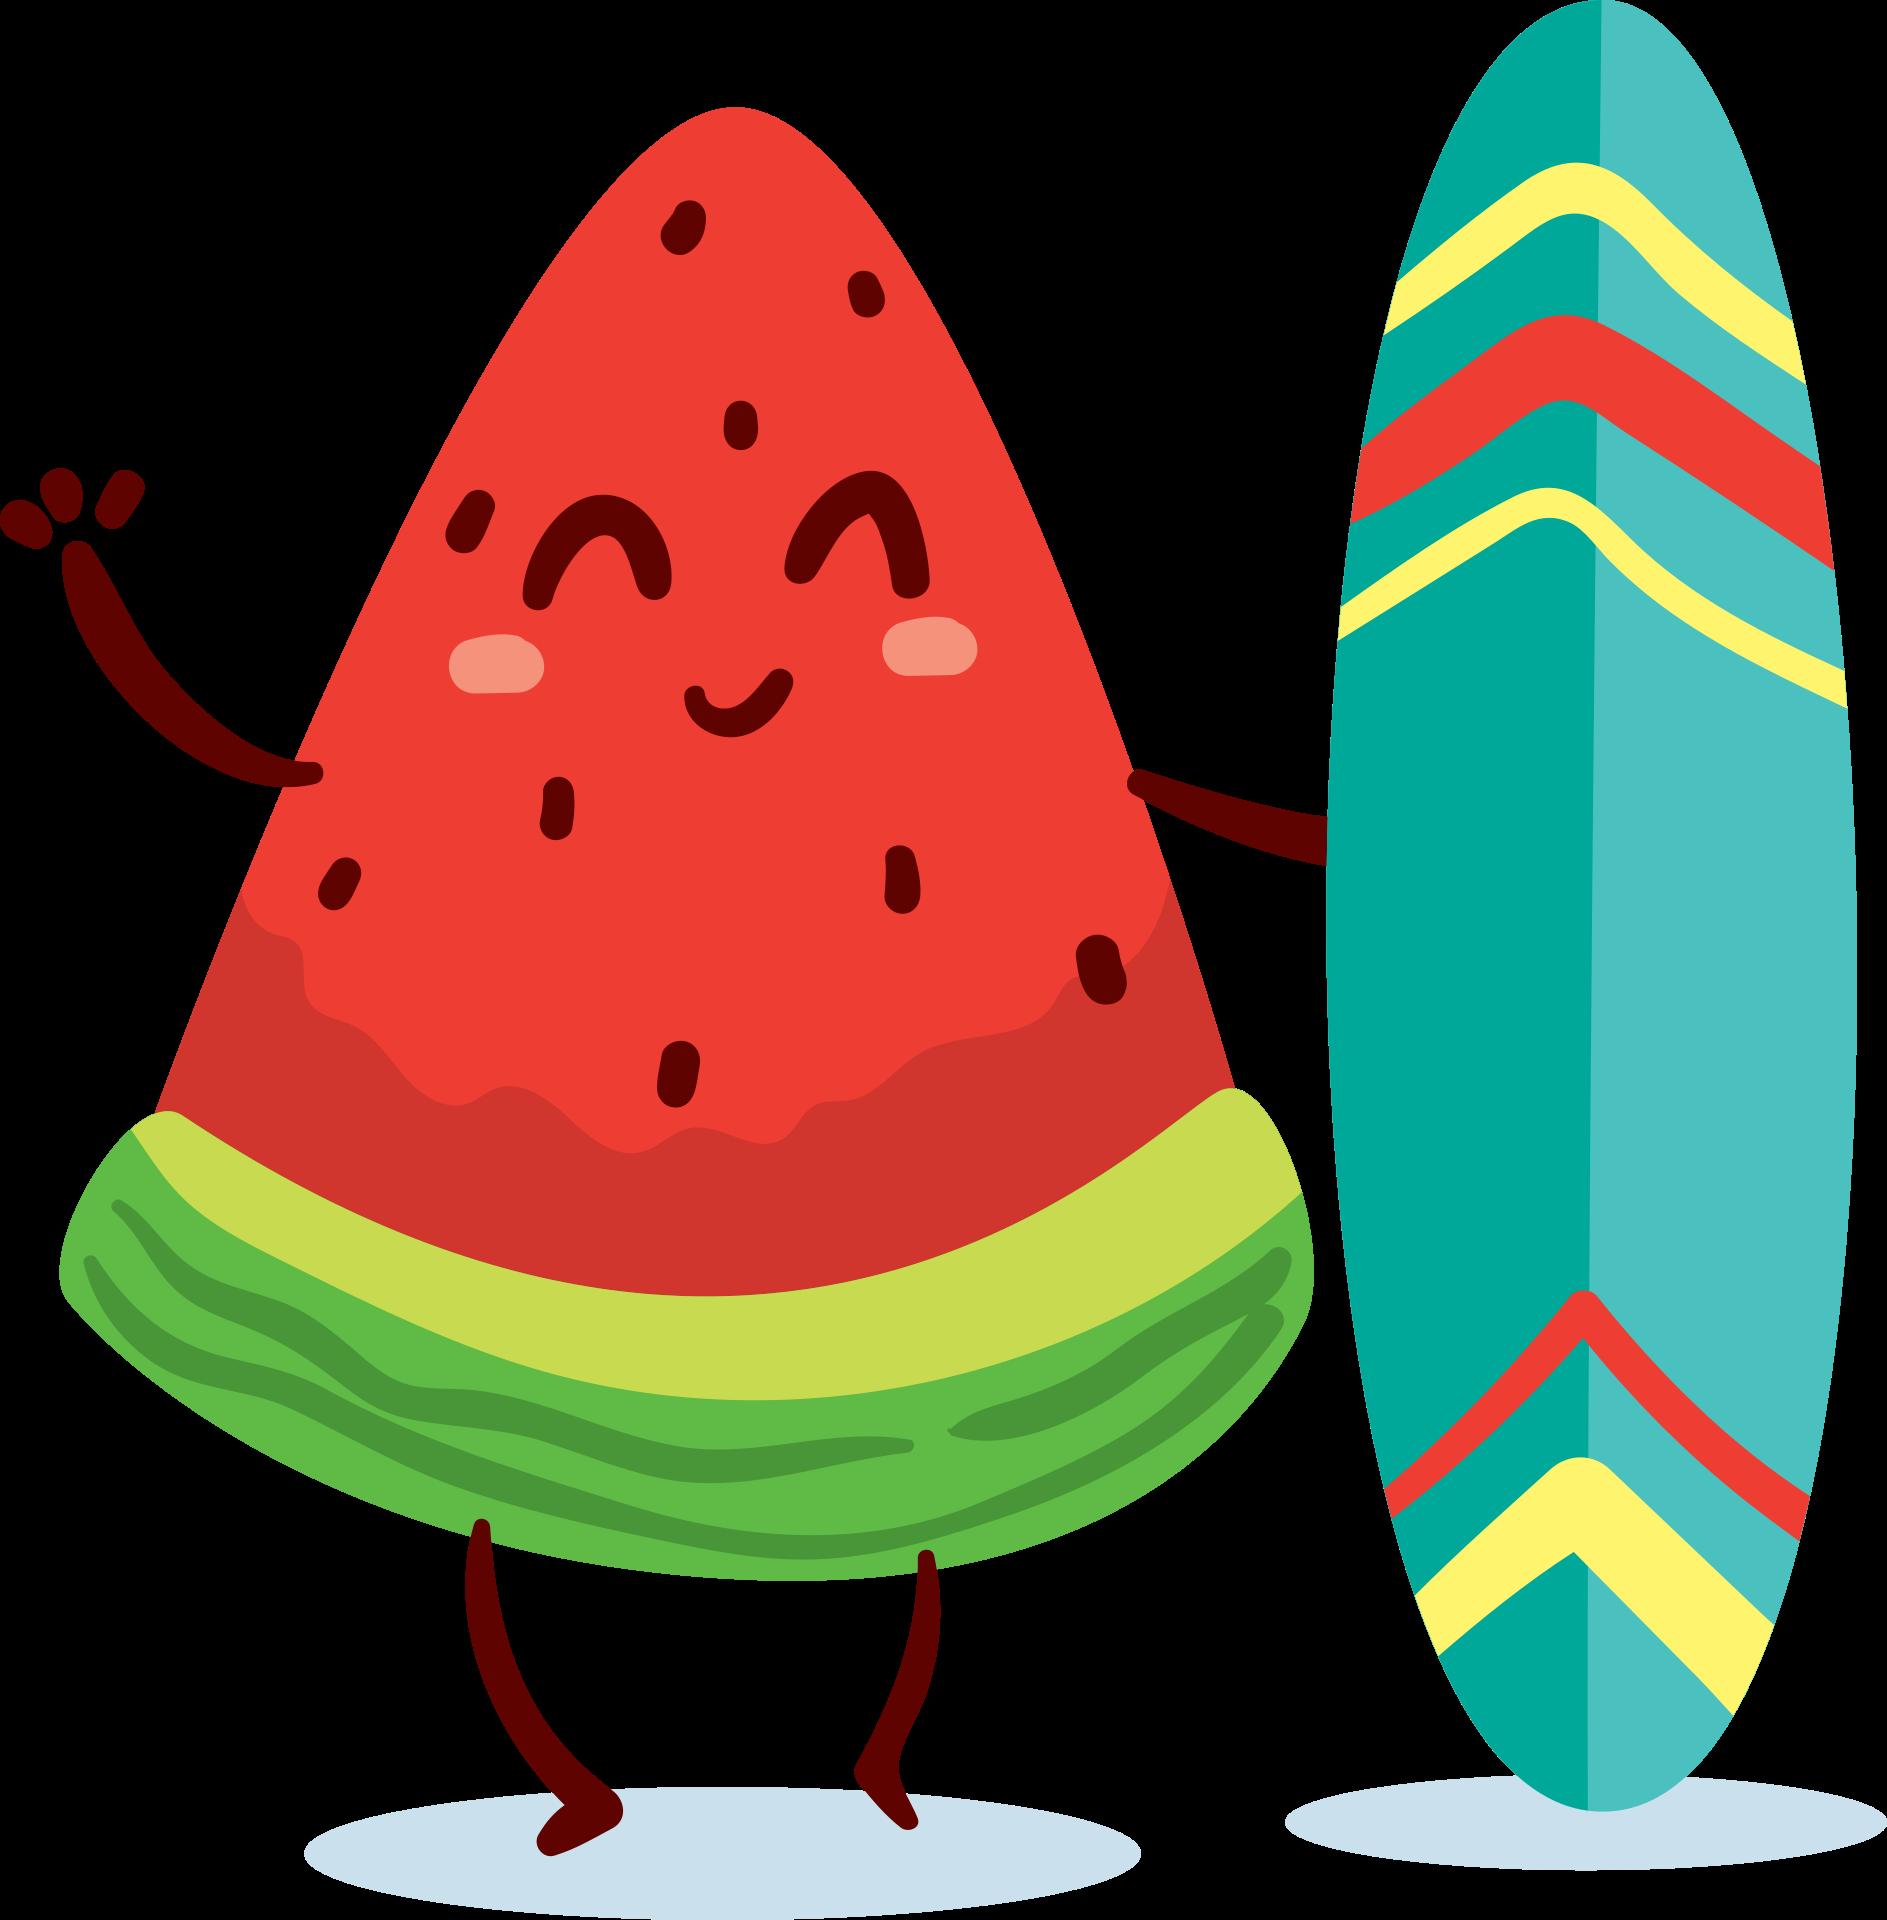 {#watermelon-4340821}